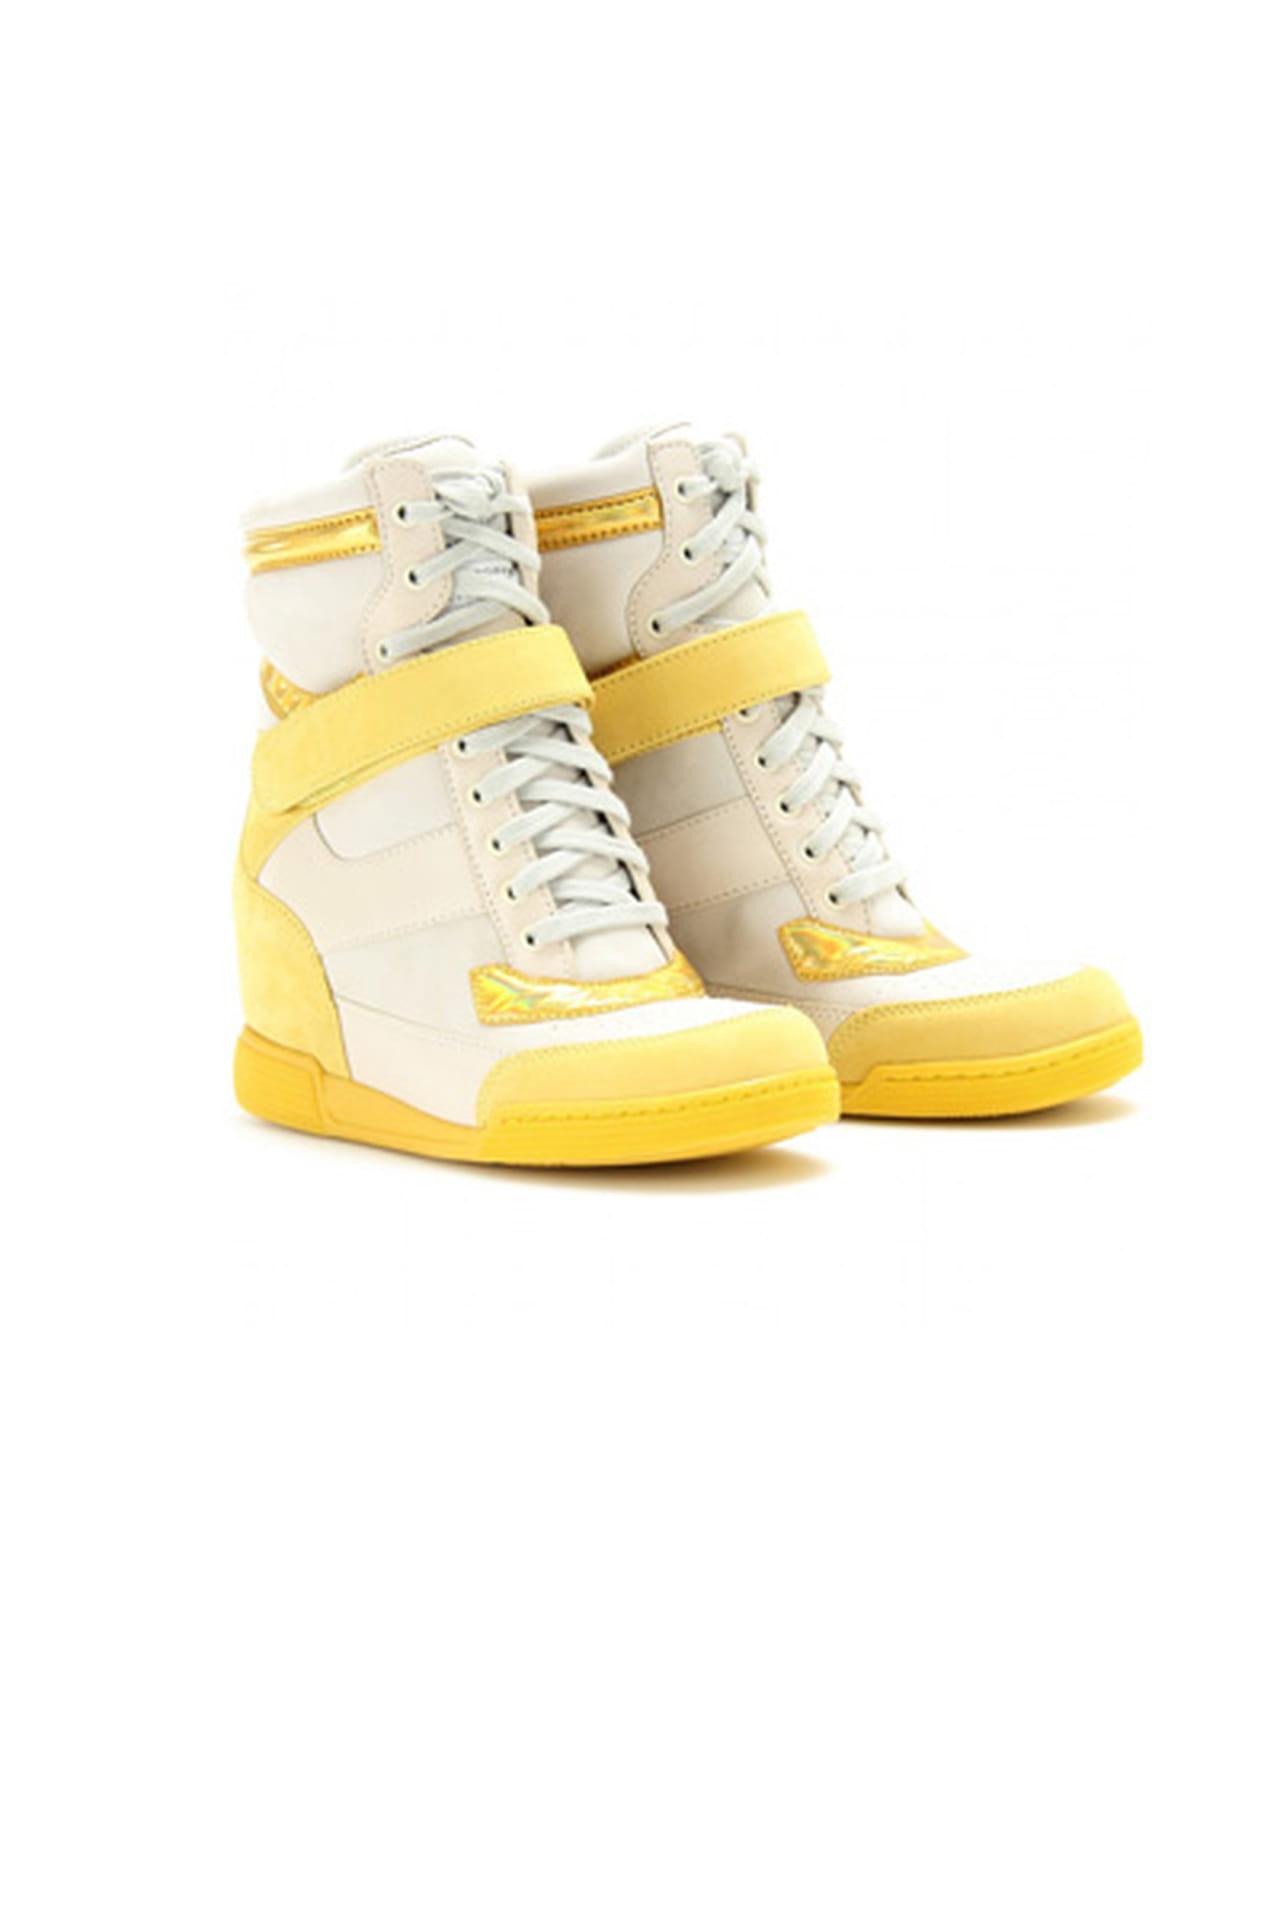 c7b221709 حذاء رياضي بكعبٍ عالٍ من Marc by Marc Jacobs